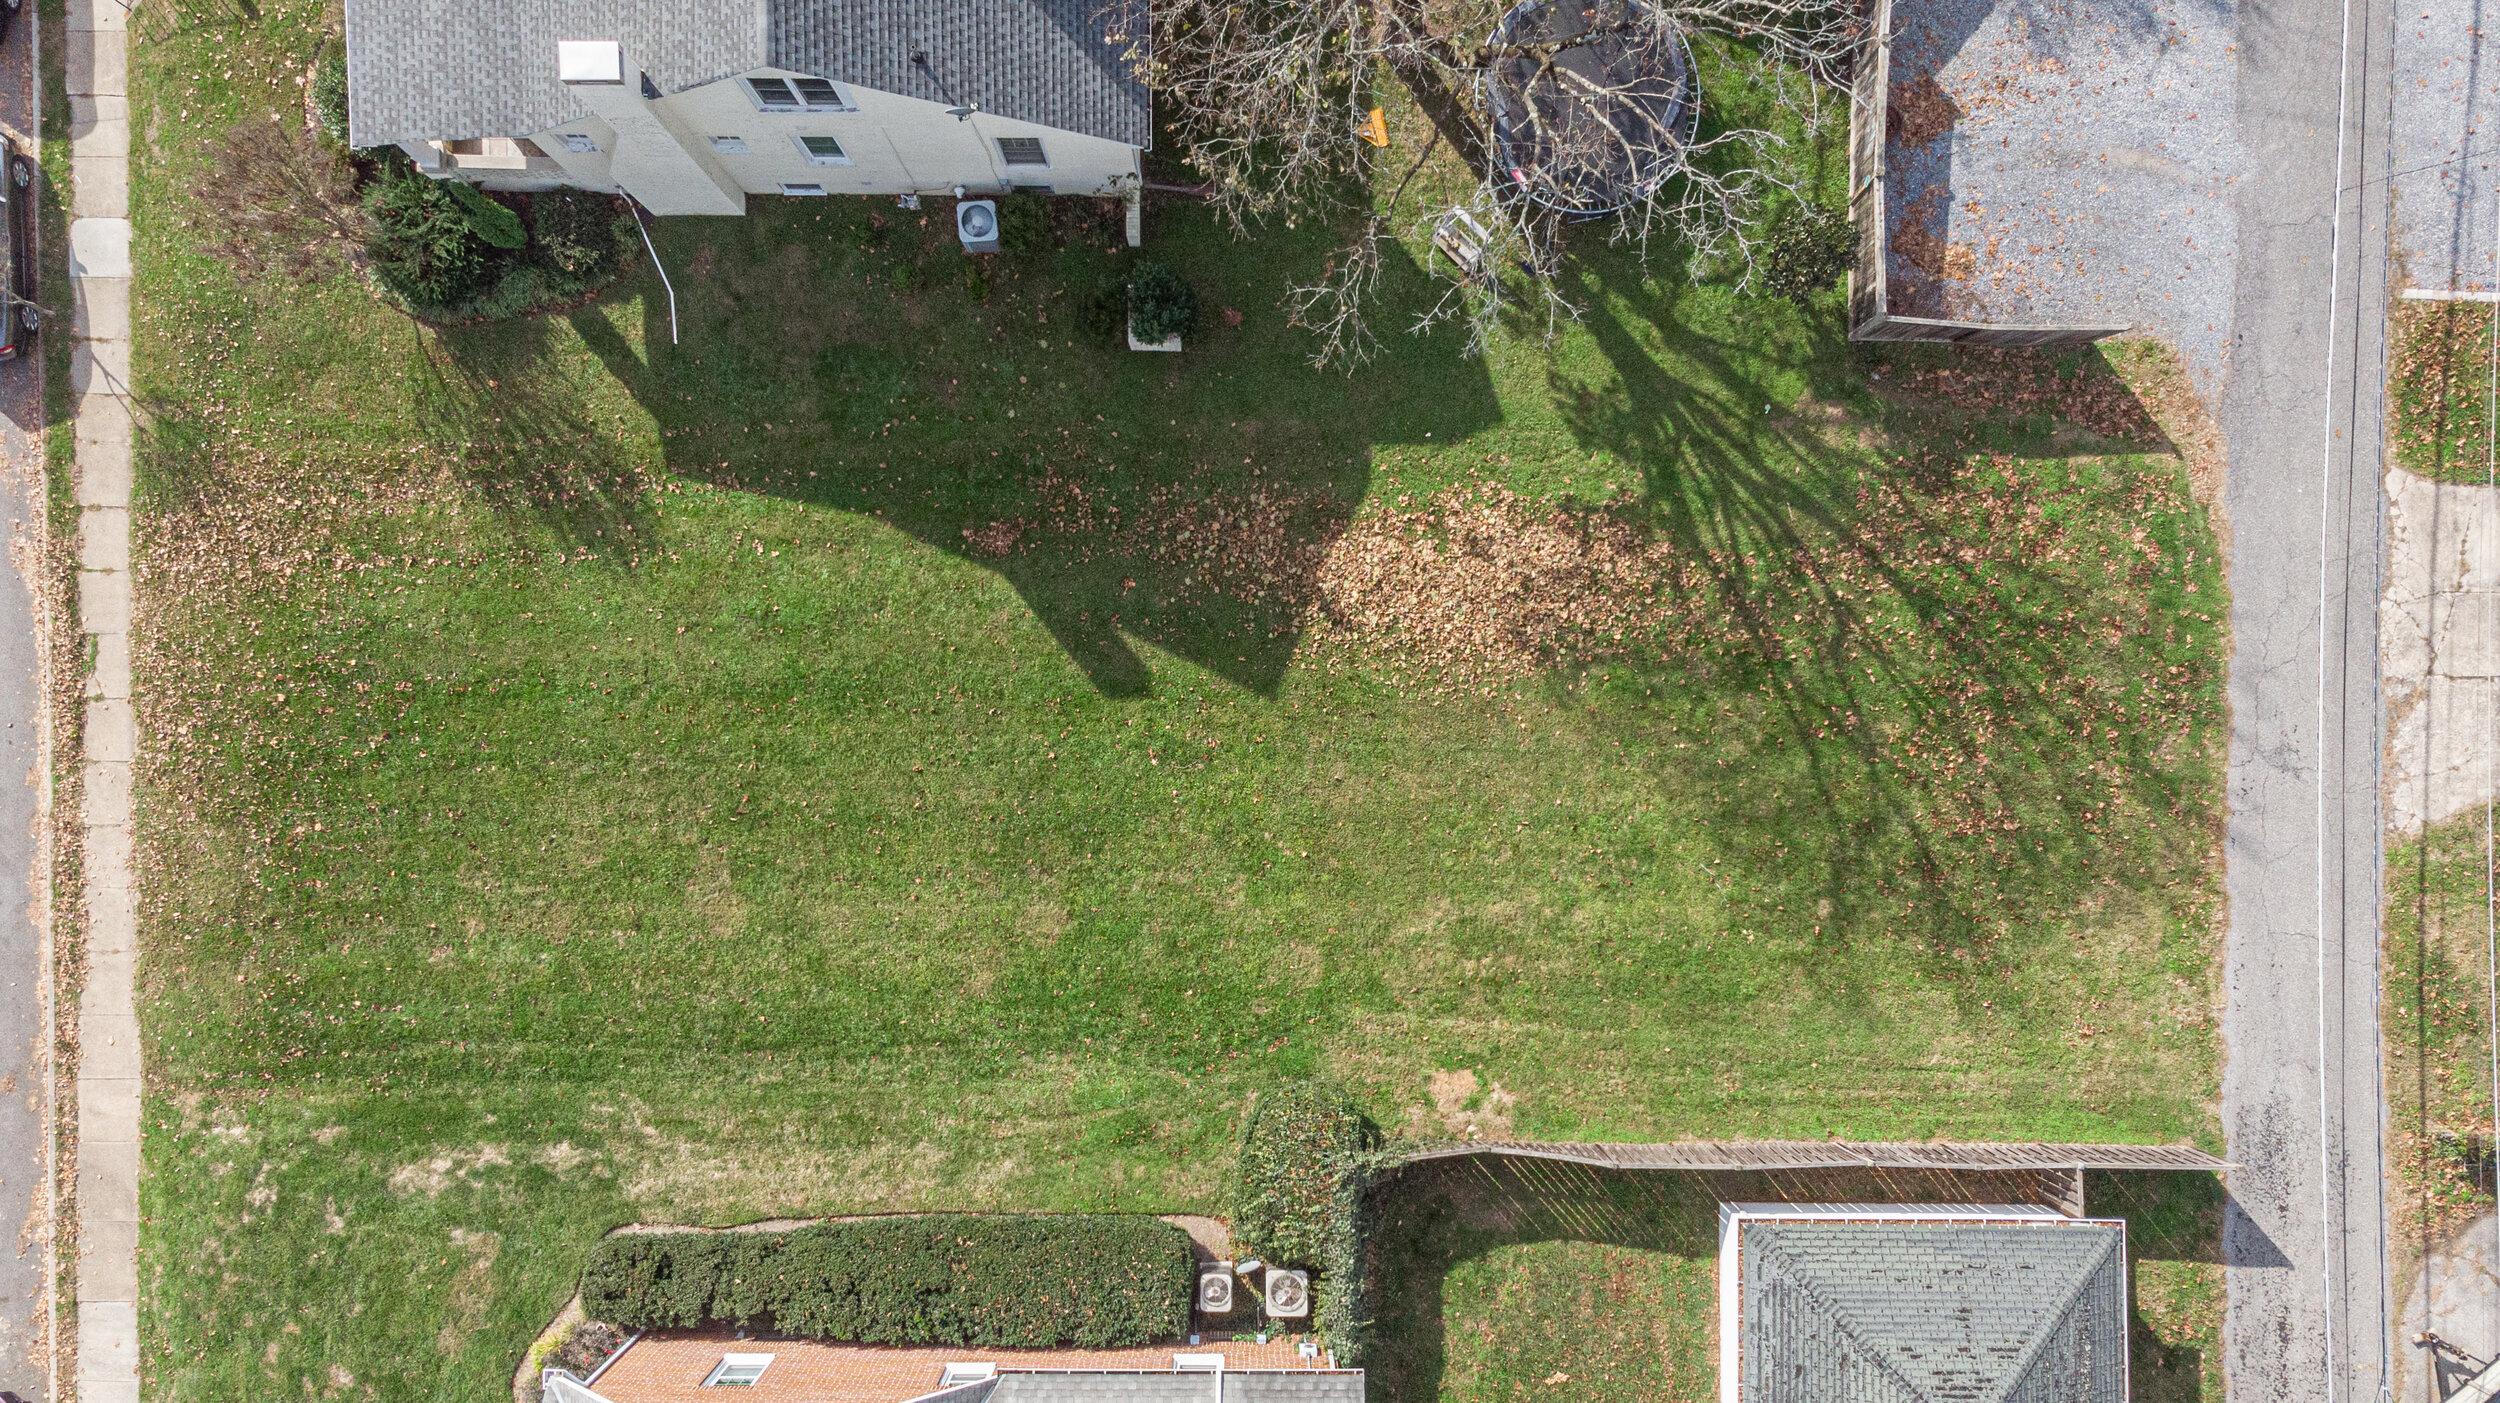 817 Magnolia Ave, Fredrick MD - Aerial-5.jpg